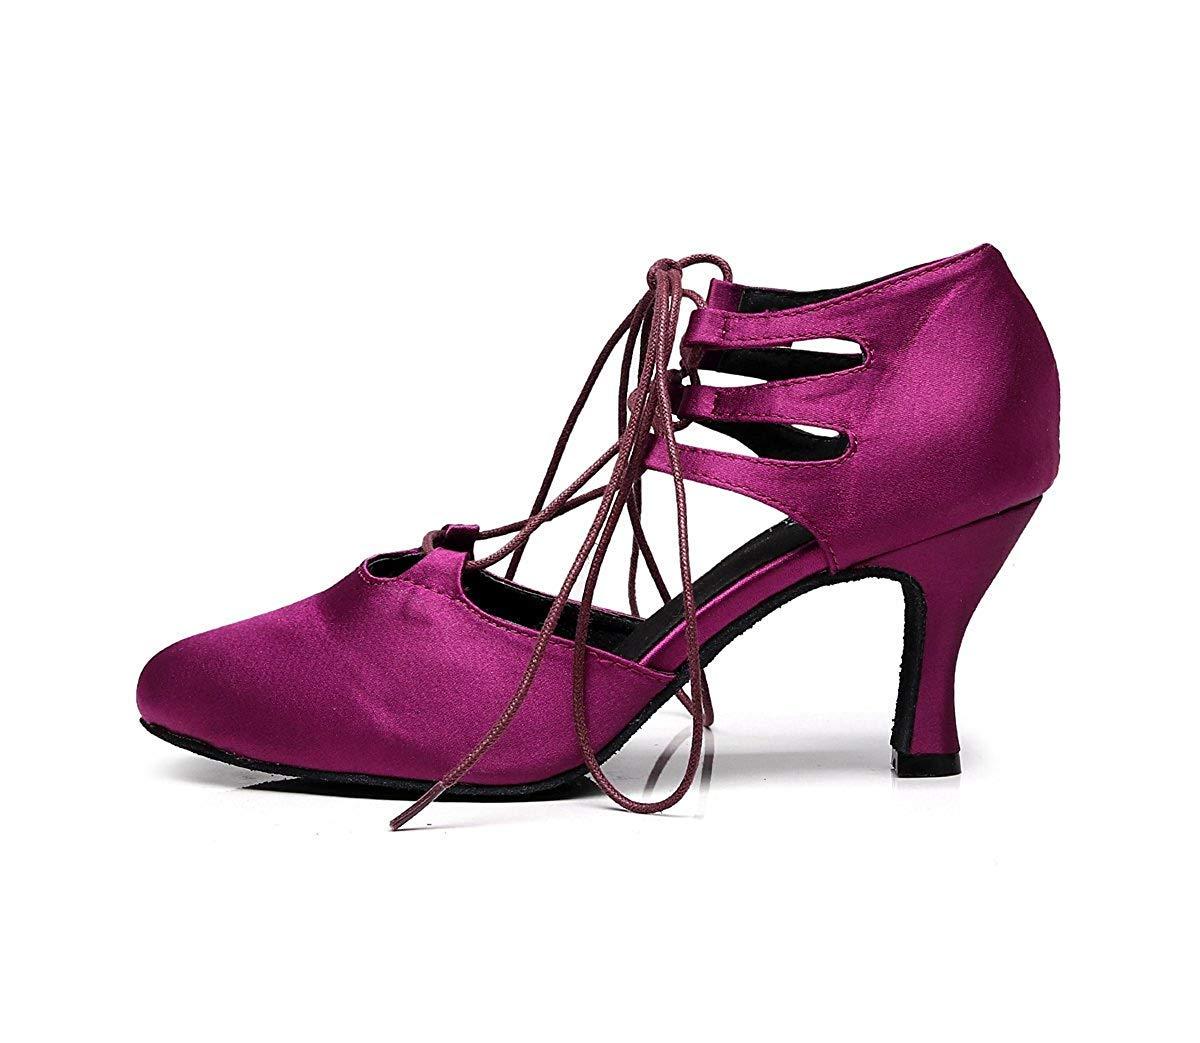 Qiusa TJ7137 Damen Mädchen Lace-up Satin Tango Latin Tanzschuhe Tanzschuhe Tanzschuhe Abend Pumps (Farbe   lila-7.5cm Heel Größe   2 UK) 82b978